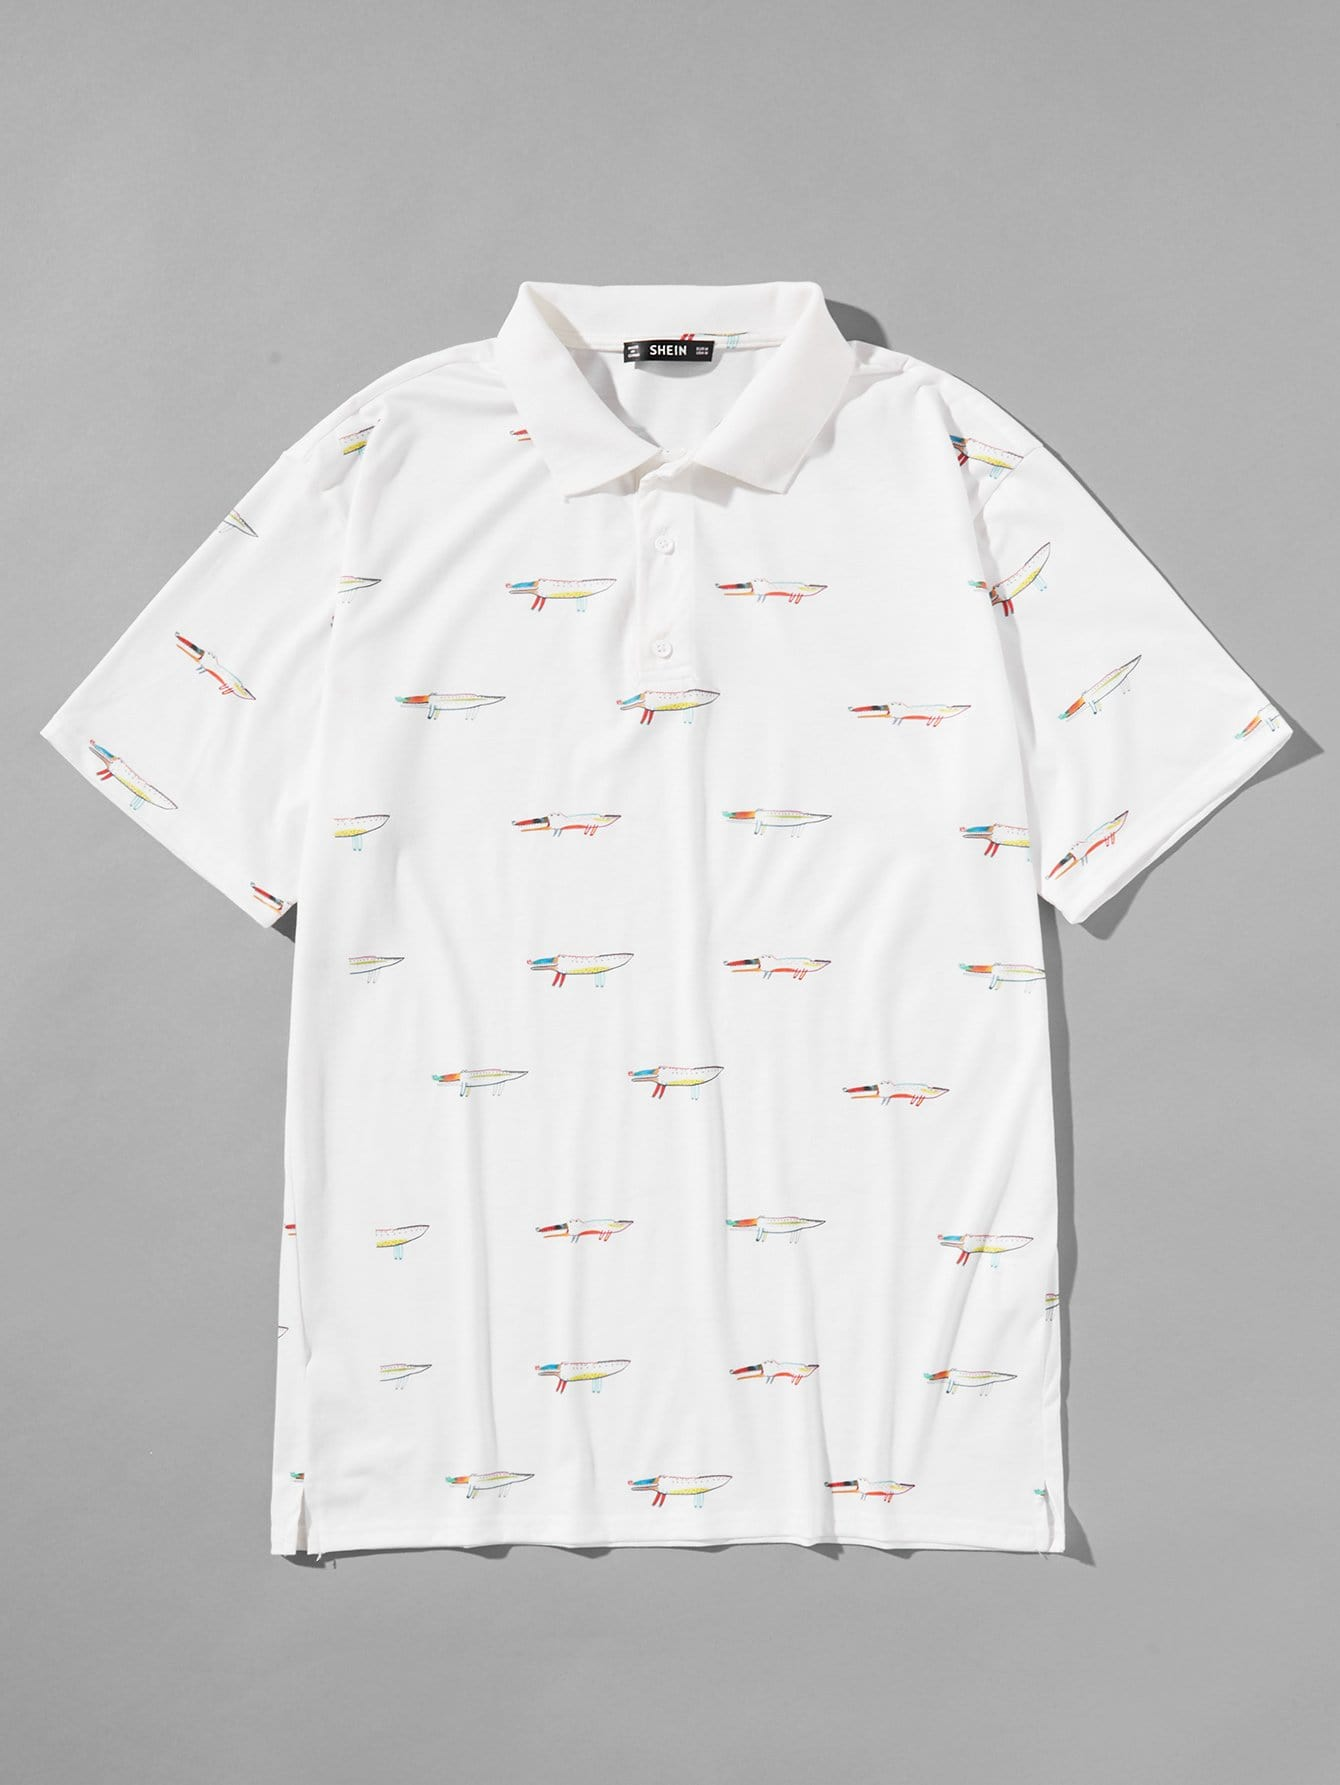 Купить Мужская рубашка для мужчин, null, SheIn